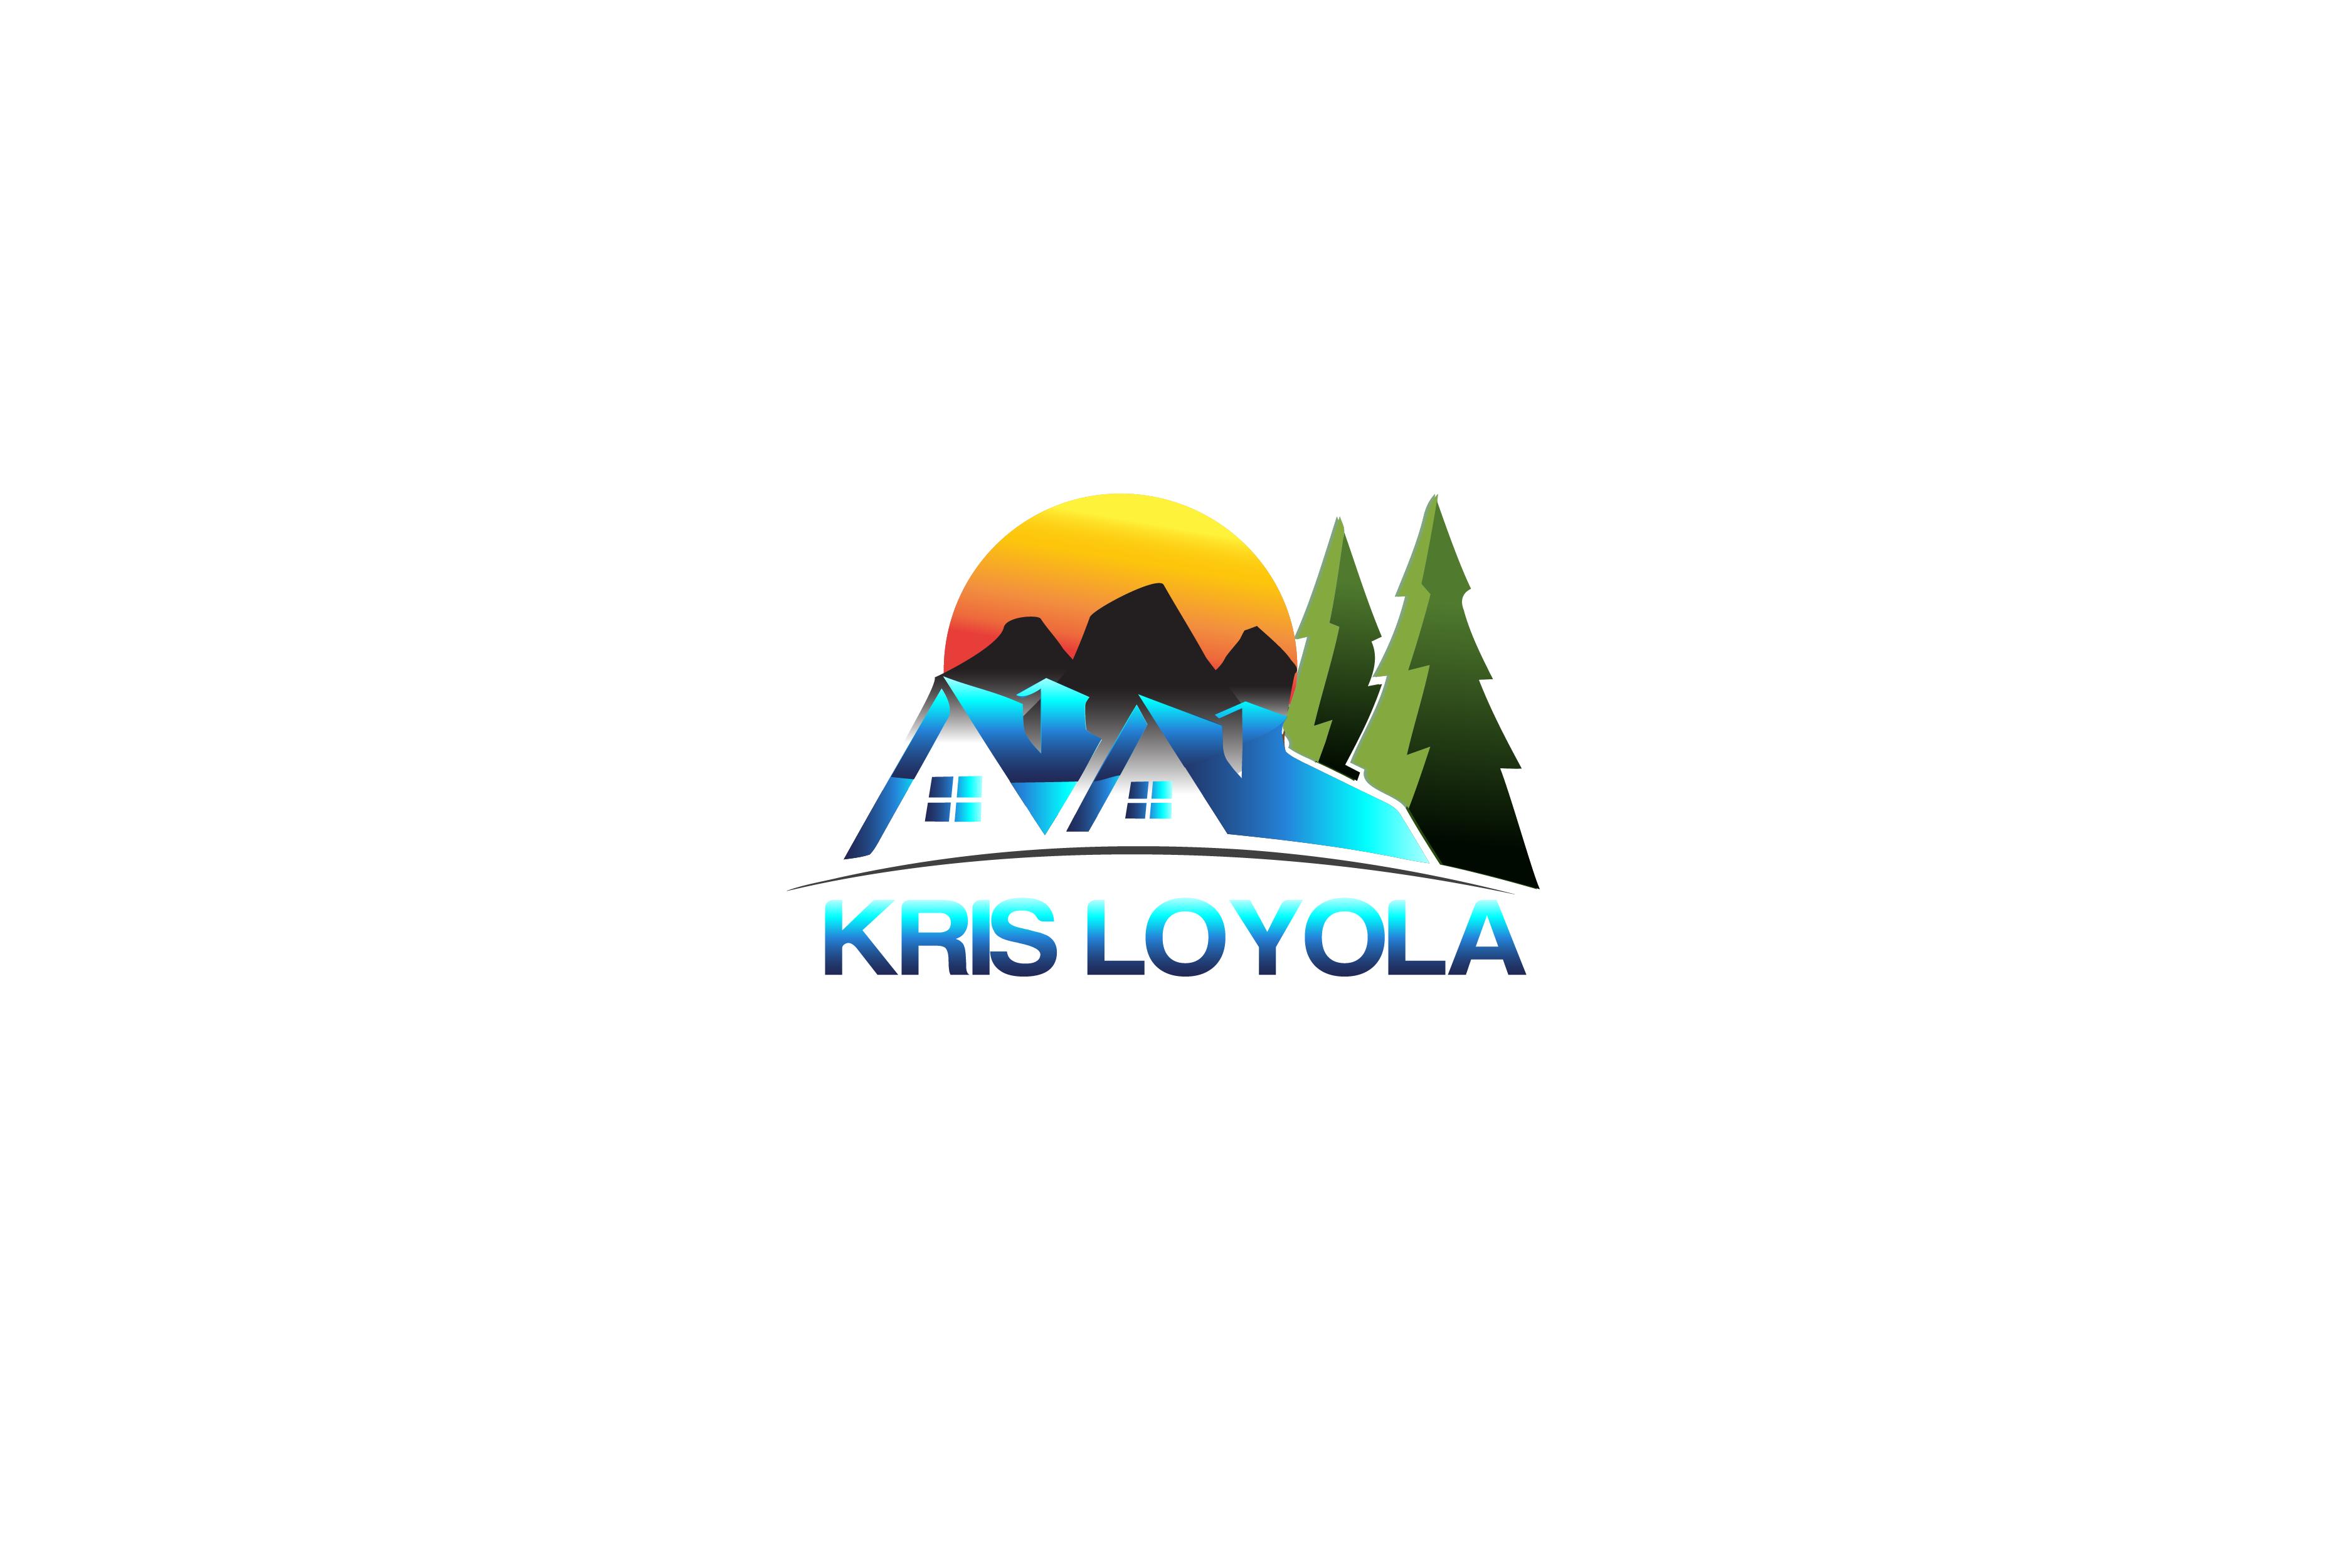 Logo Design by Private User - Entry No. 120 in the Logo Design Contest Kris Loyola Logo Design.